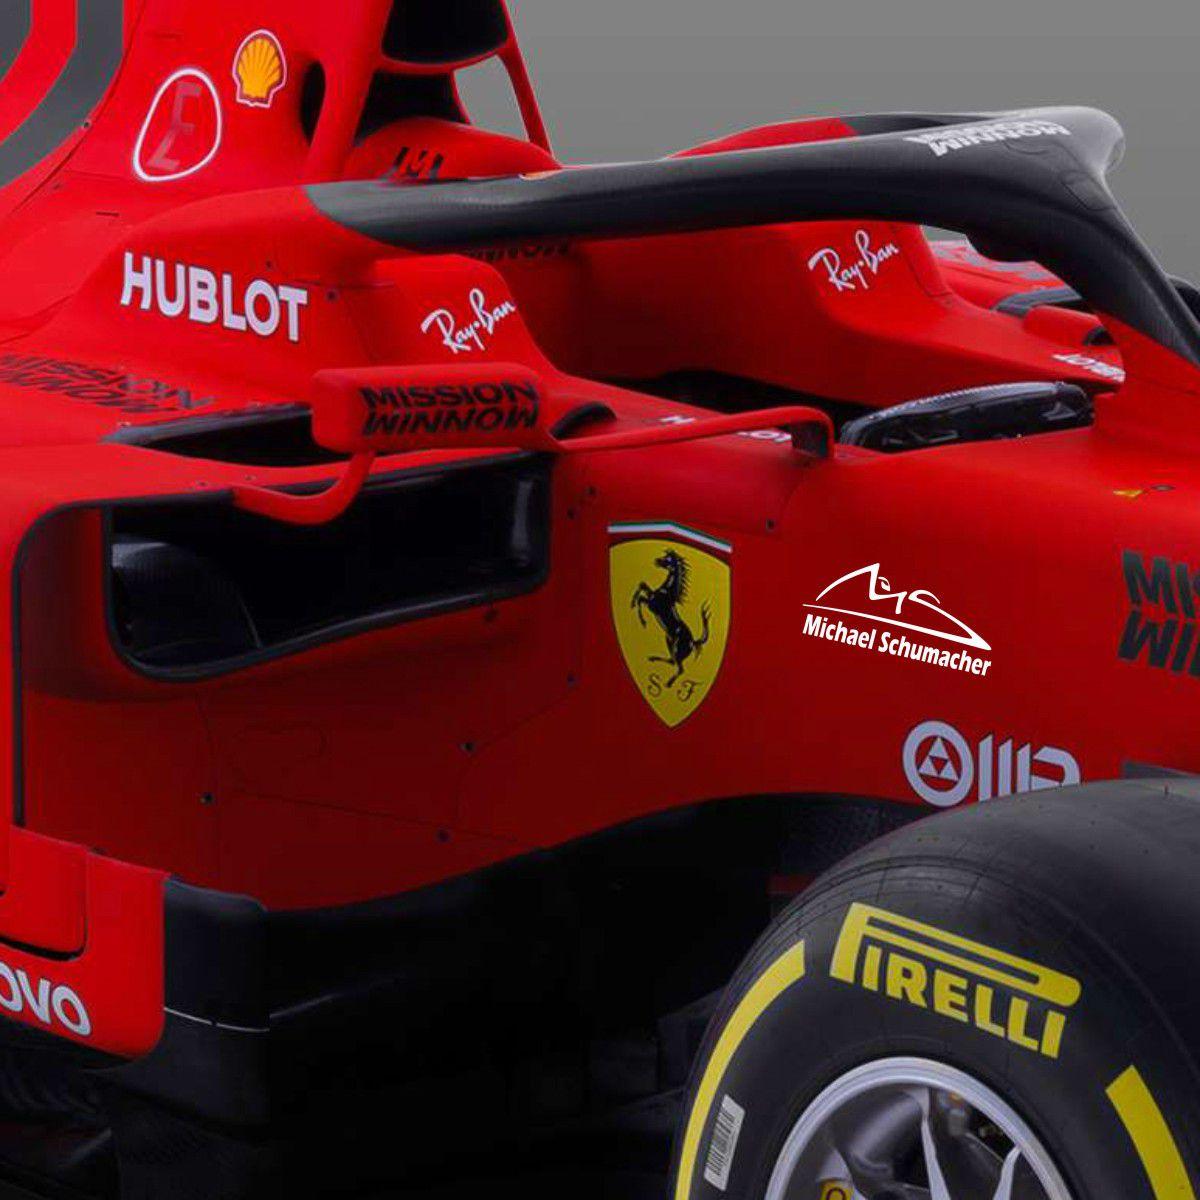 kit com 3 Adesivos Michael Schumacher - Minis 15x5cm